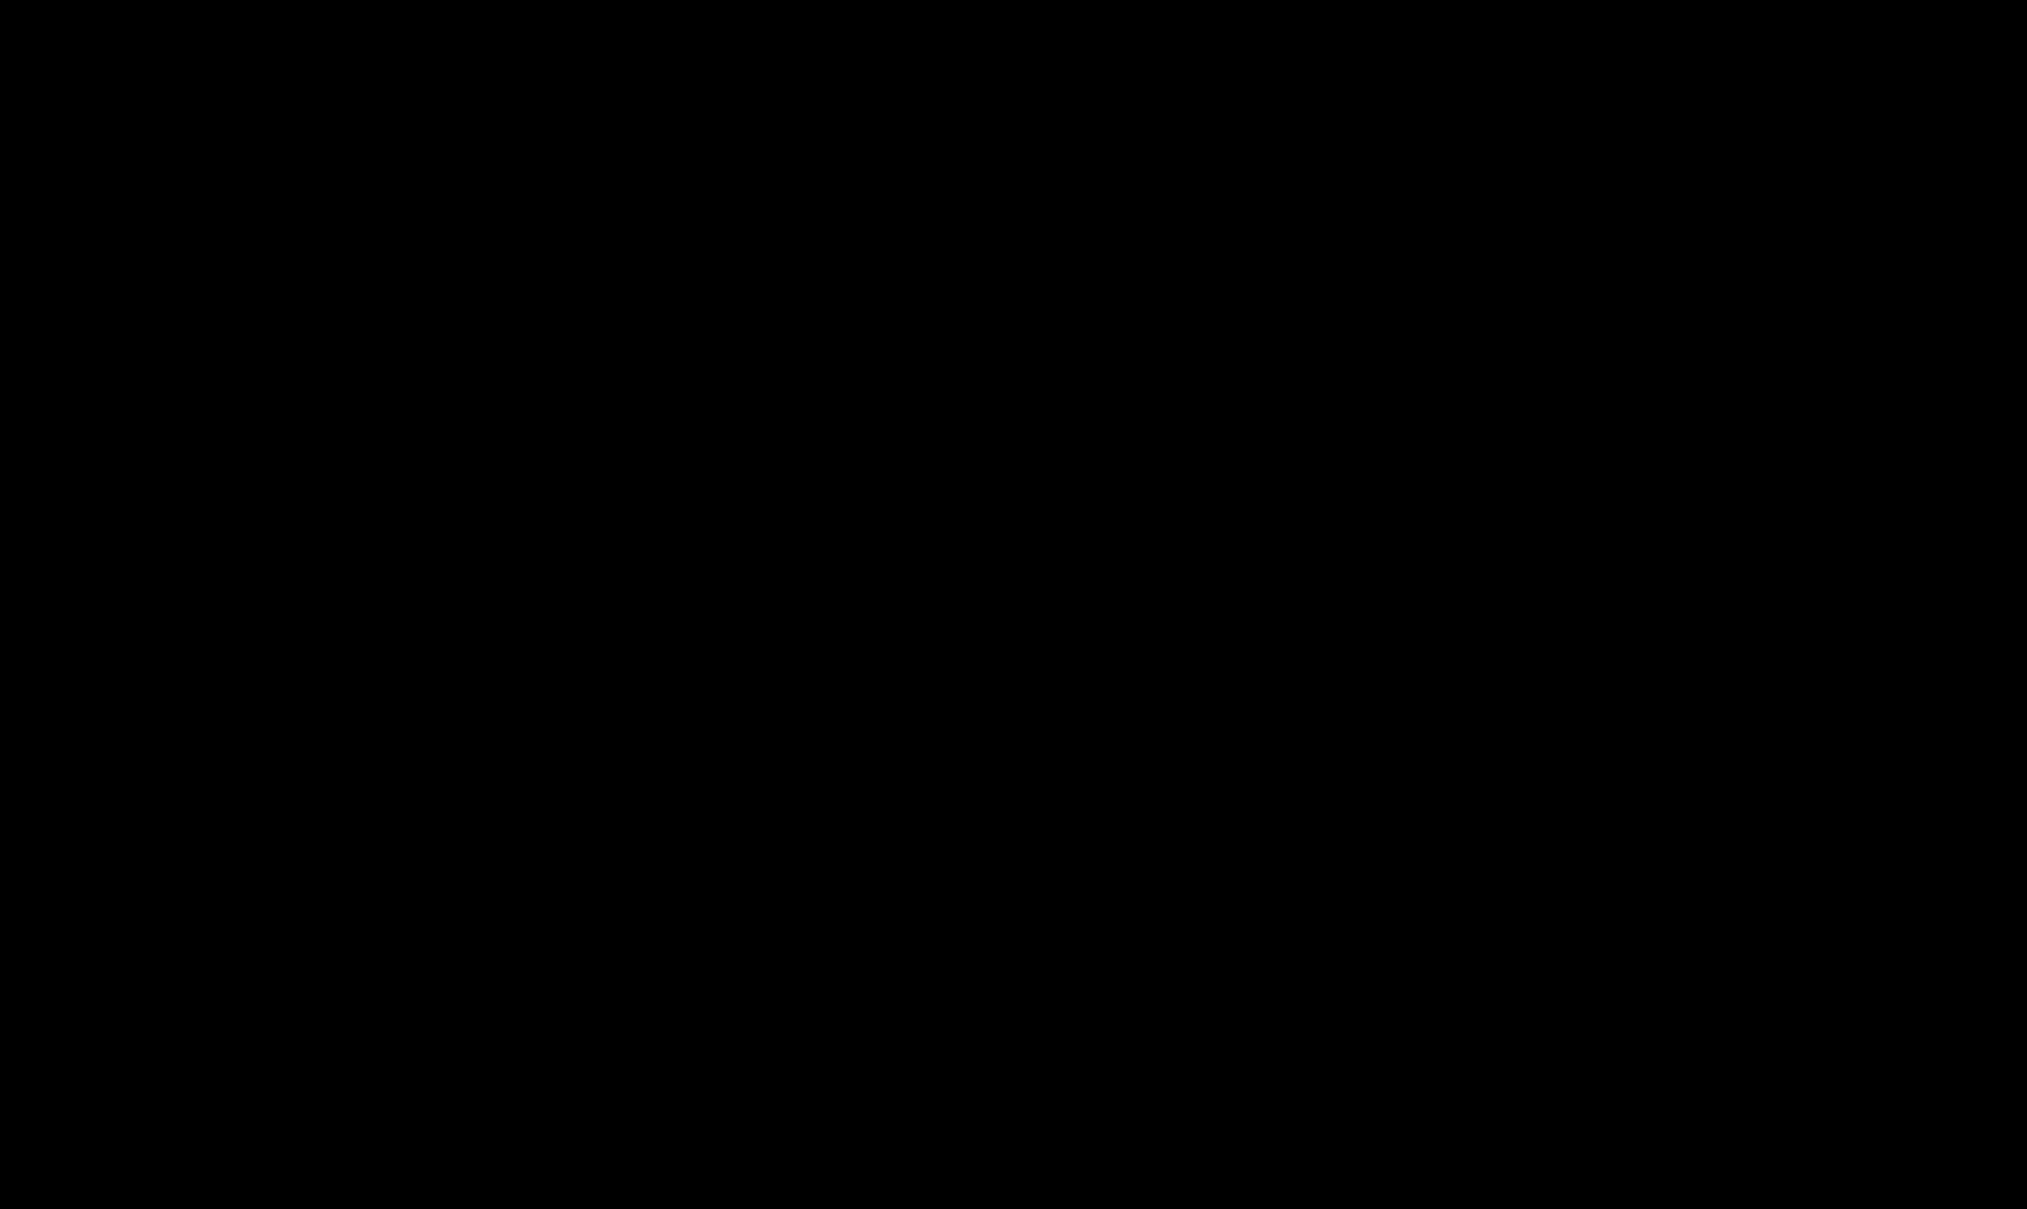 MAL-dPEG®₁₂-Tris(-dPEG®₁₁-amido-MAL)₃